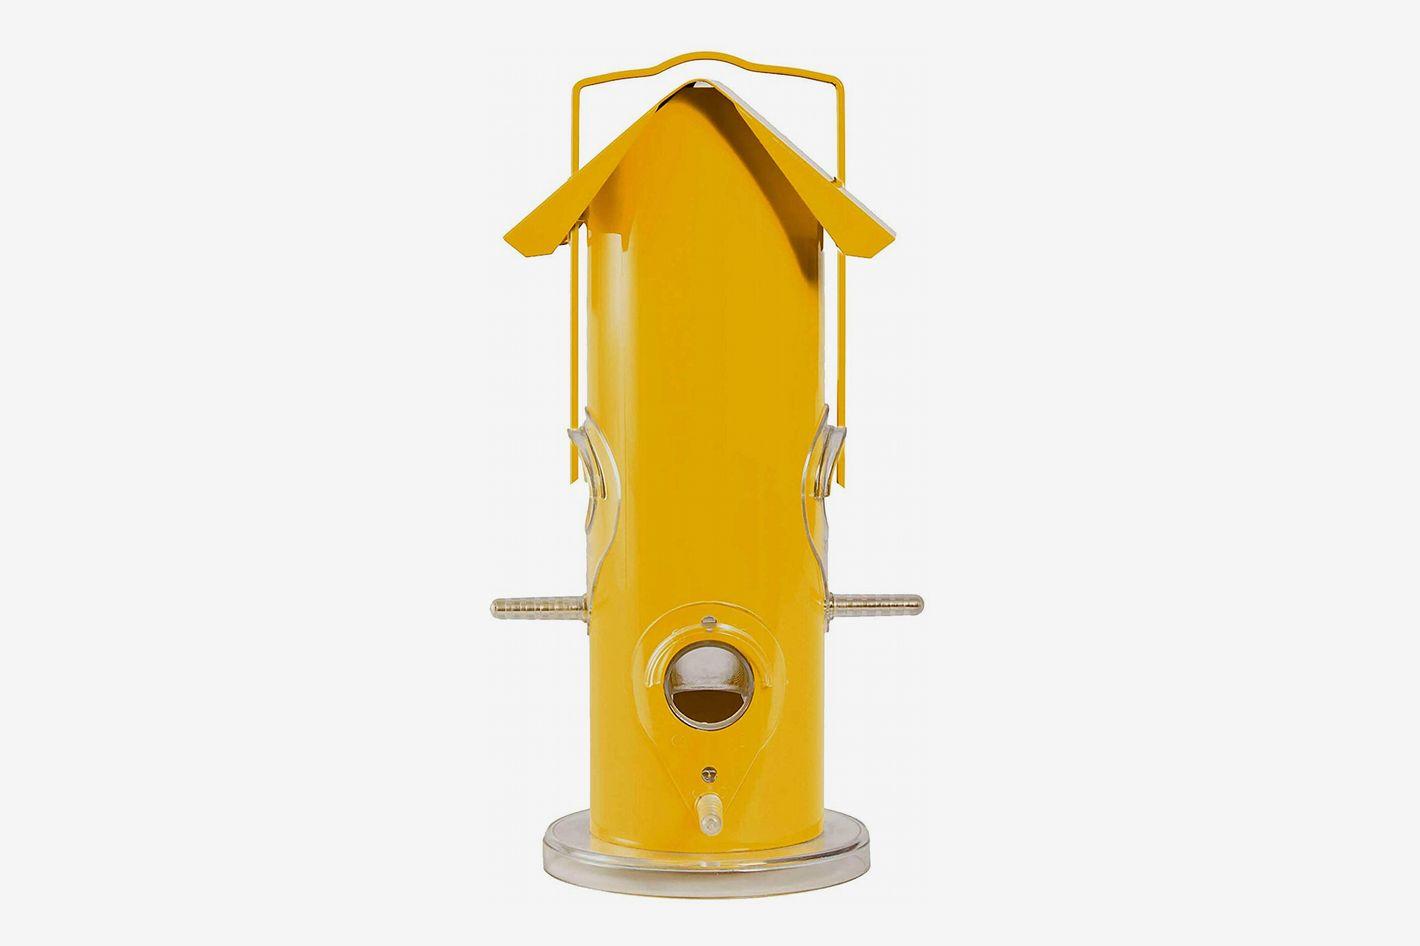 Perky-Pet Yellow Metal Tube Wild Bird Feeder